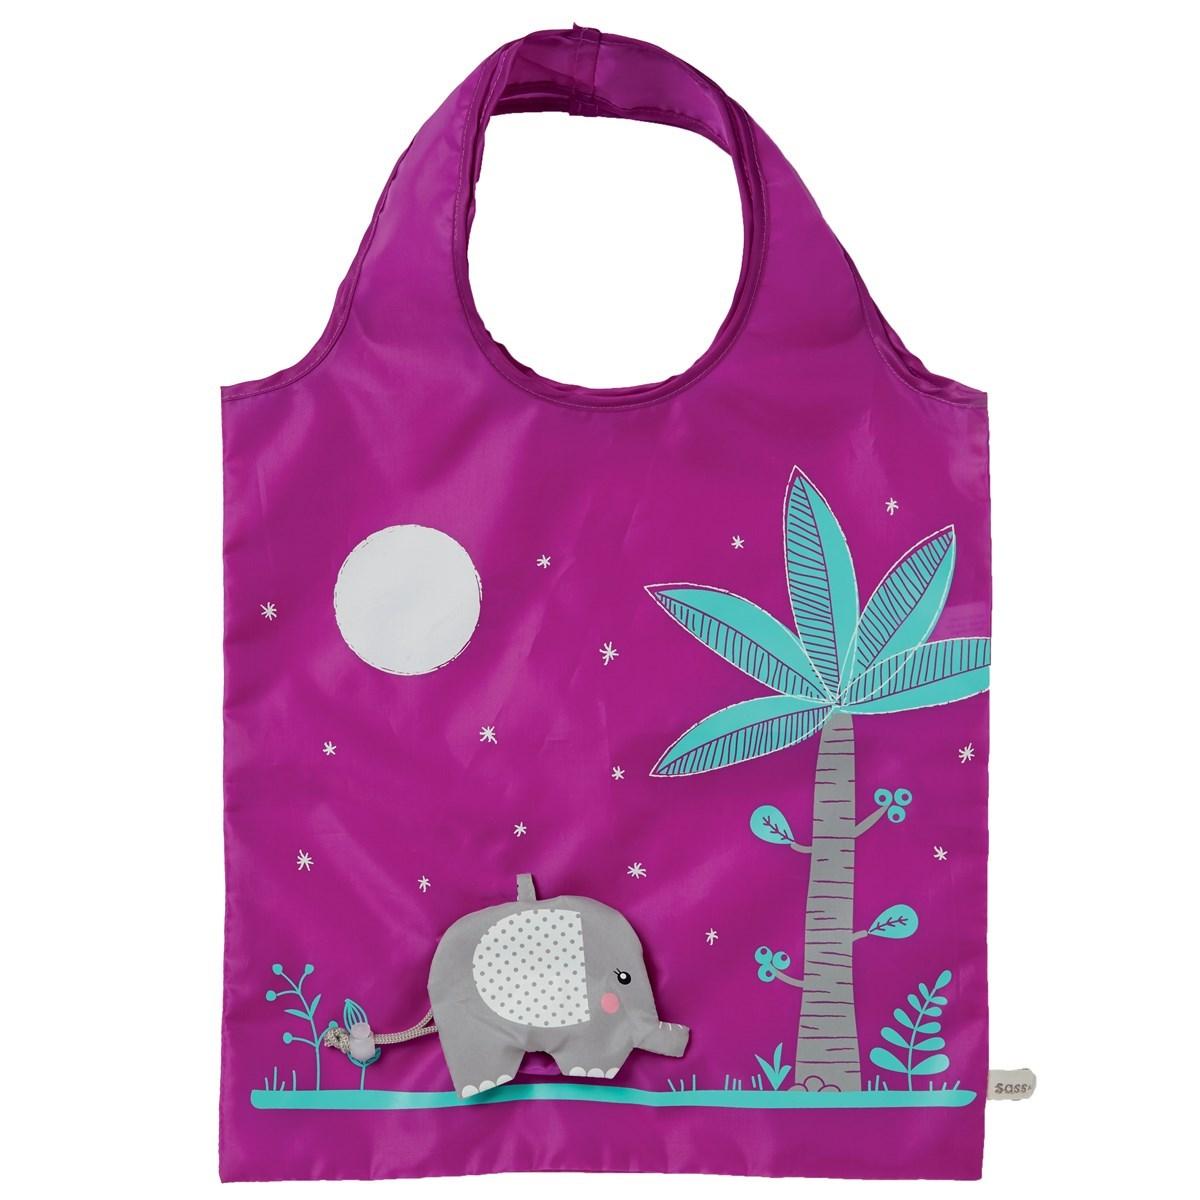 15d69ebac Elephant Foldable Shopping Bag Default Image